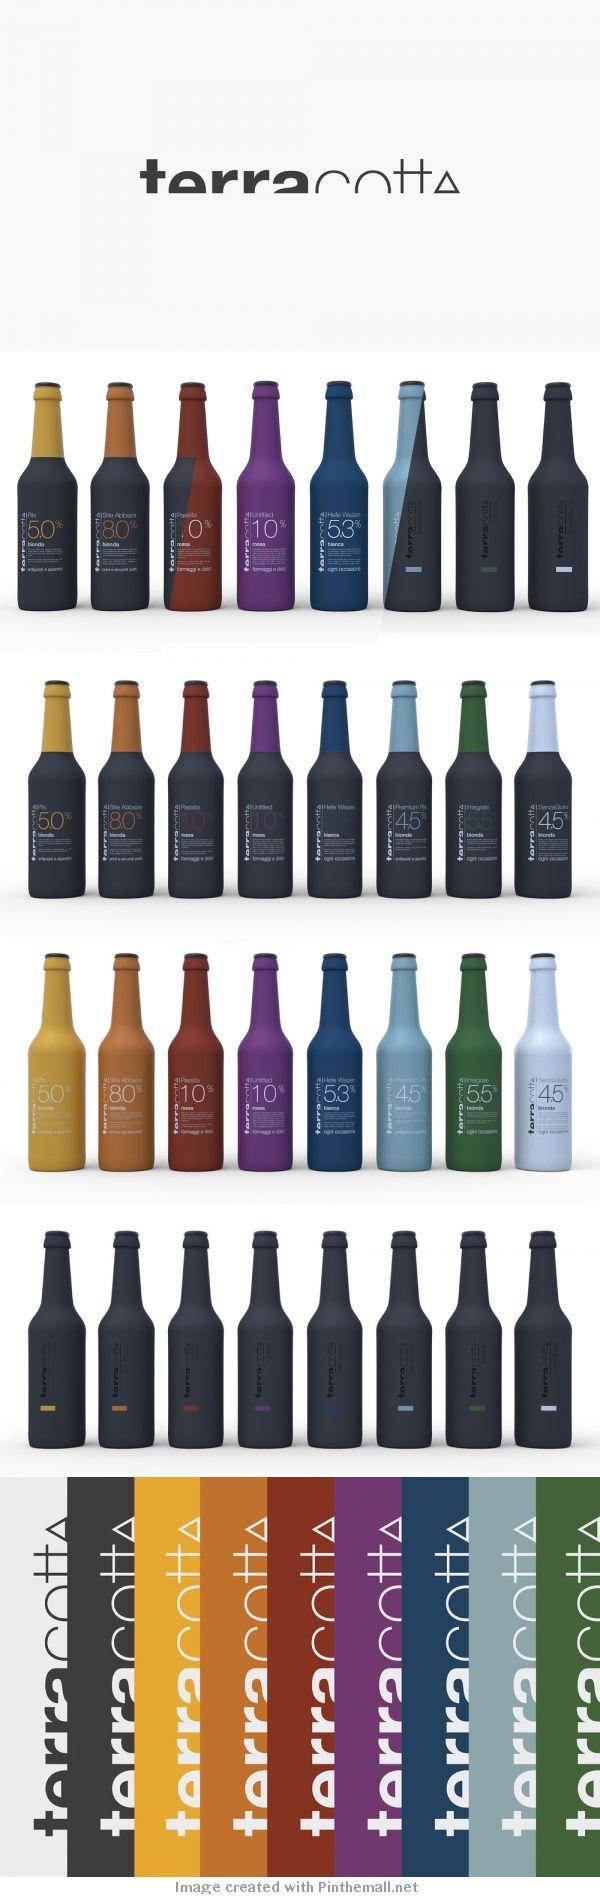 Concept Terracotta | Multicolor bottle packaging design series